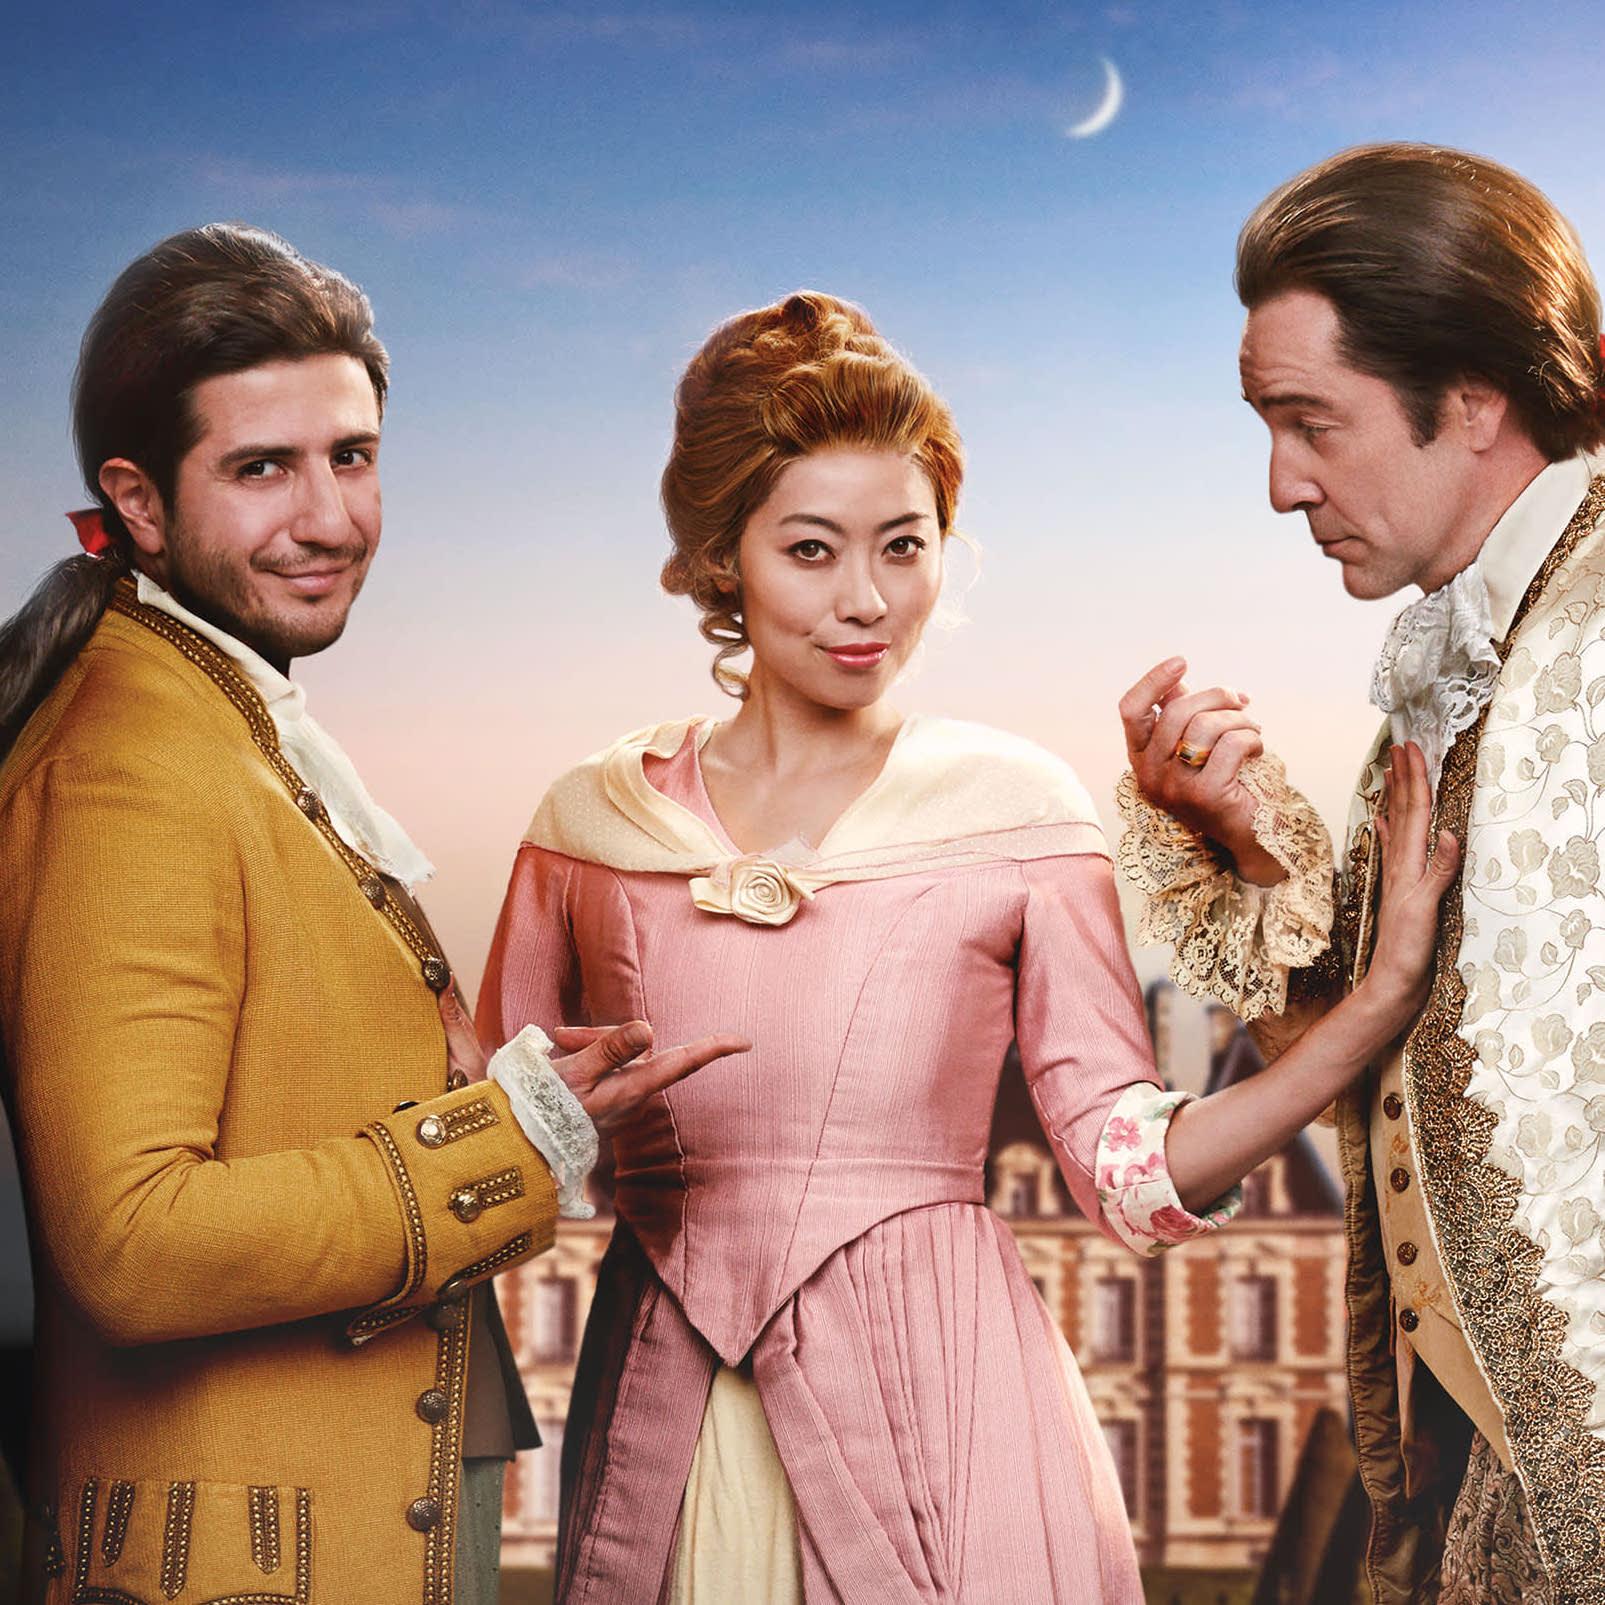 The 3 Lead Characters_LA Opera Marriage of Figaro